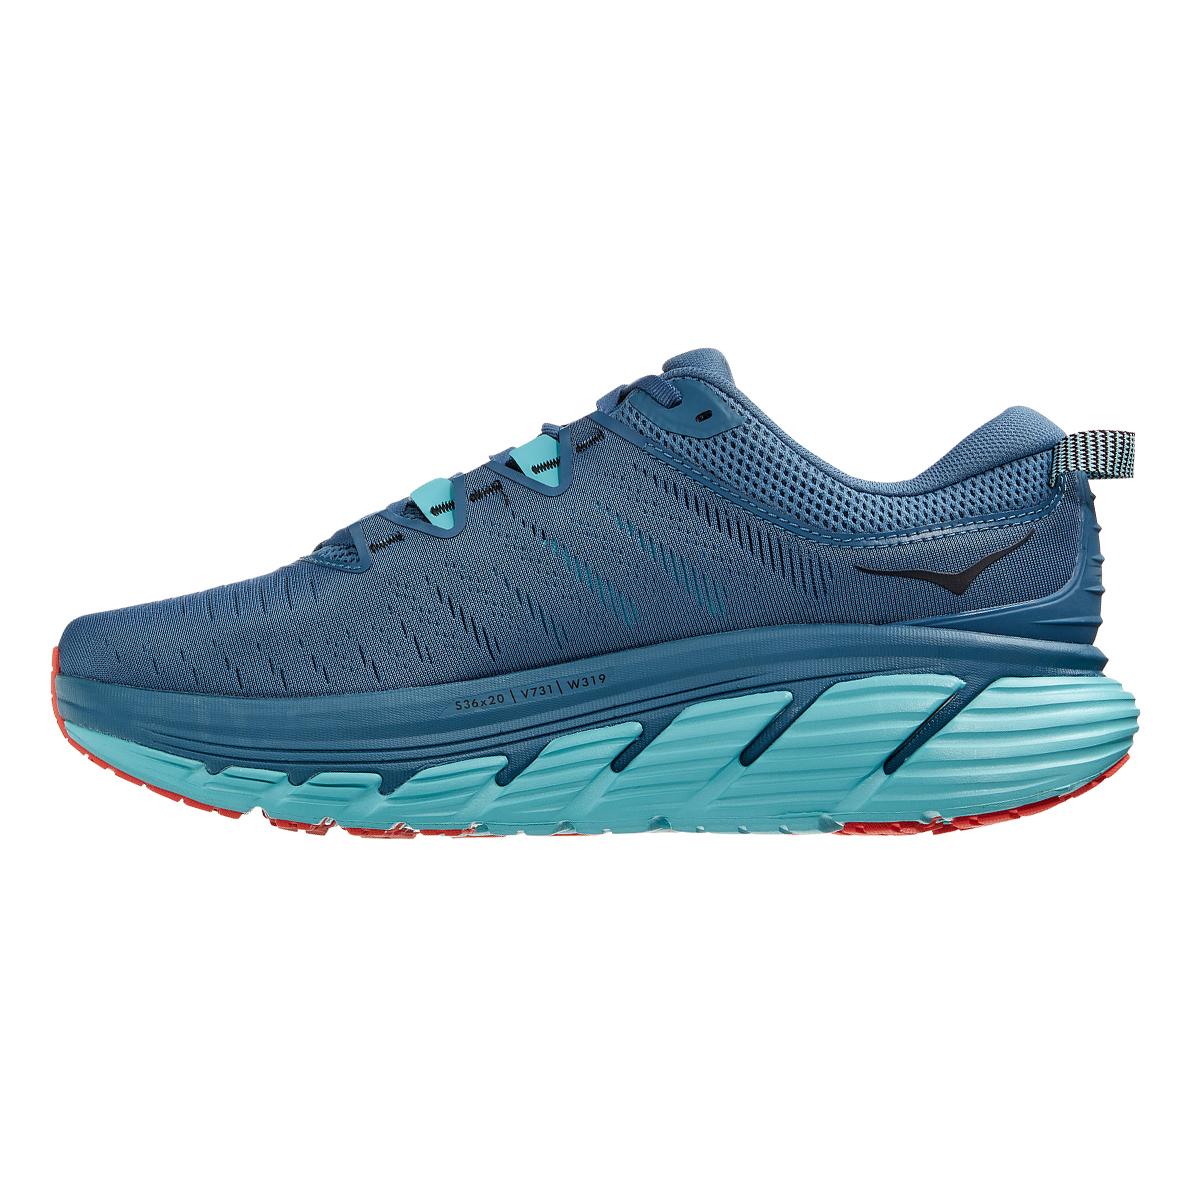 Men's Hoka One One Gaviota 3 Running Shoe - Color: Real Teal / Aquarelle - Size: 7 - Width: Regular, Real Teal / Aquarelle, large, image 2